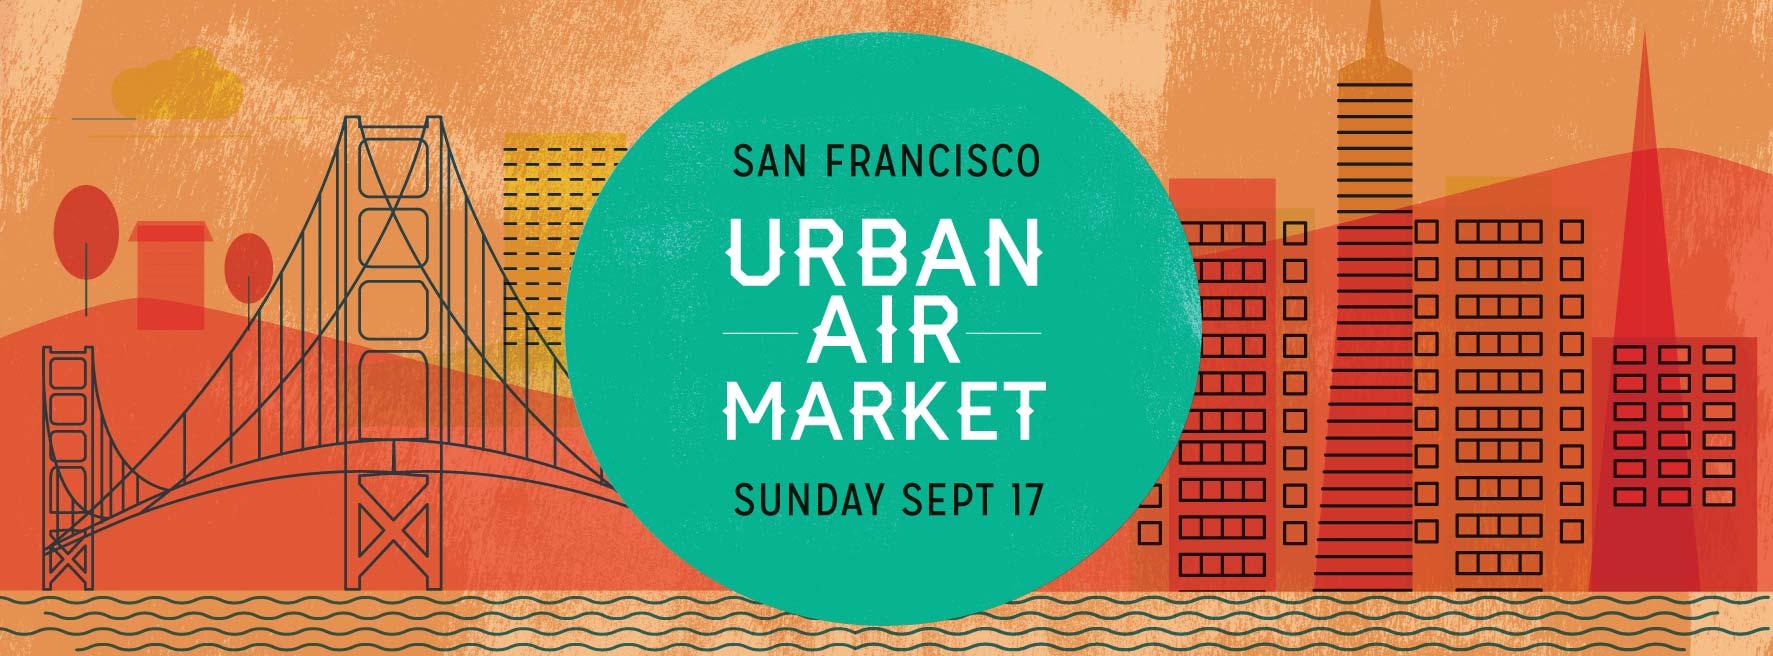 Urban-air-market-metta-good.jpg